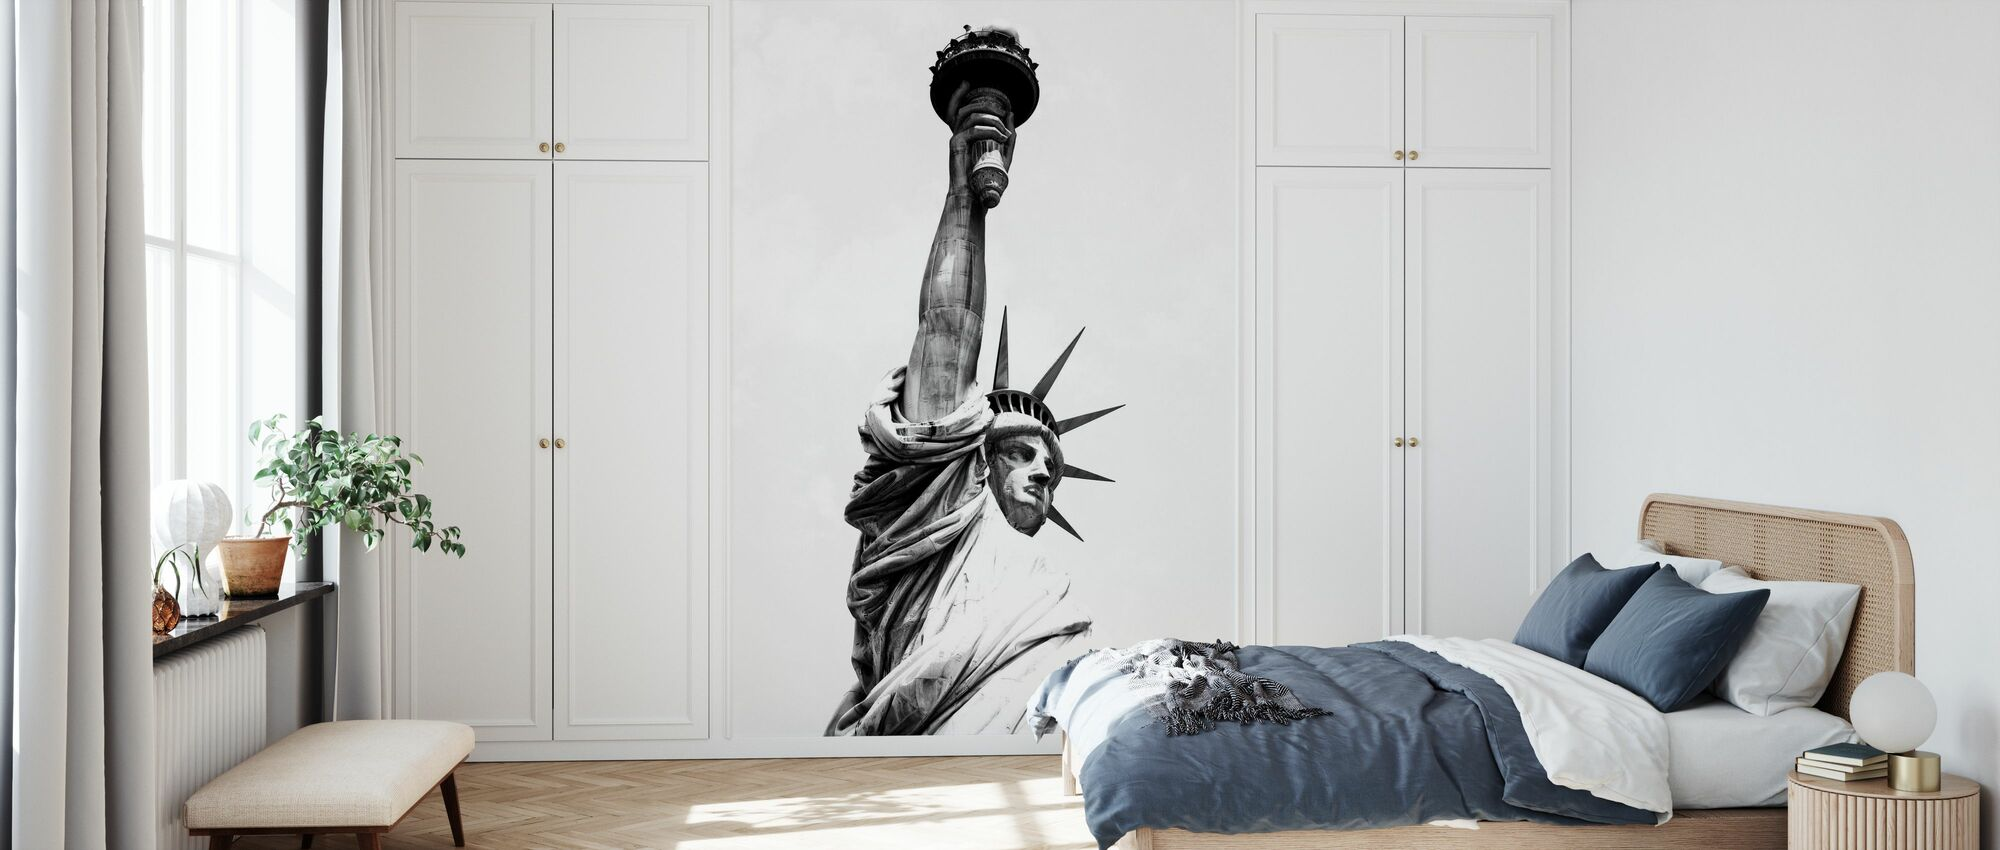 Black Manhattan - Lady Liberty - Tapet - Soveværelse